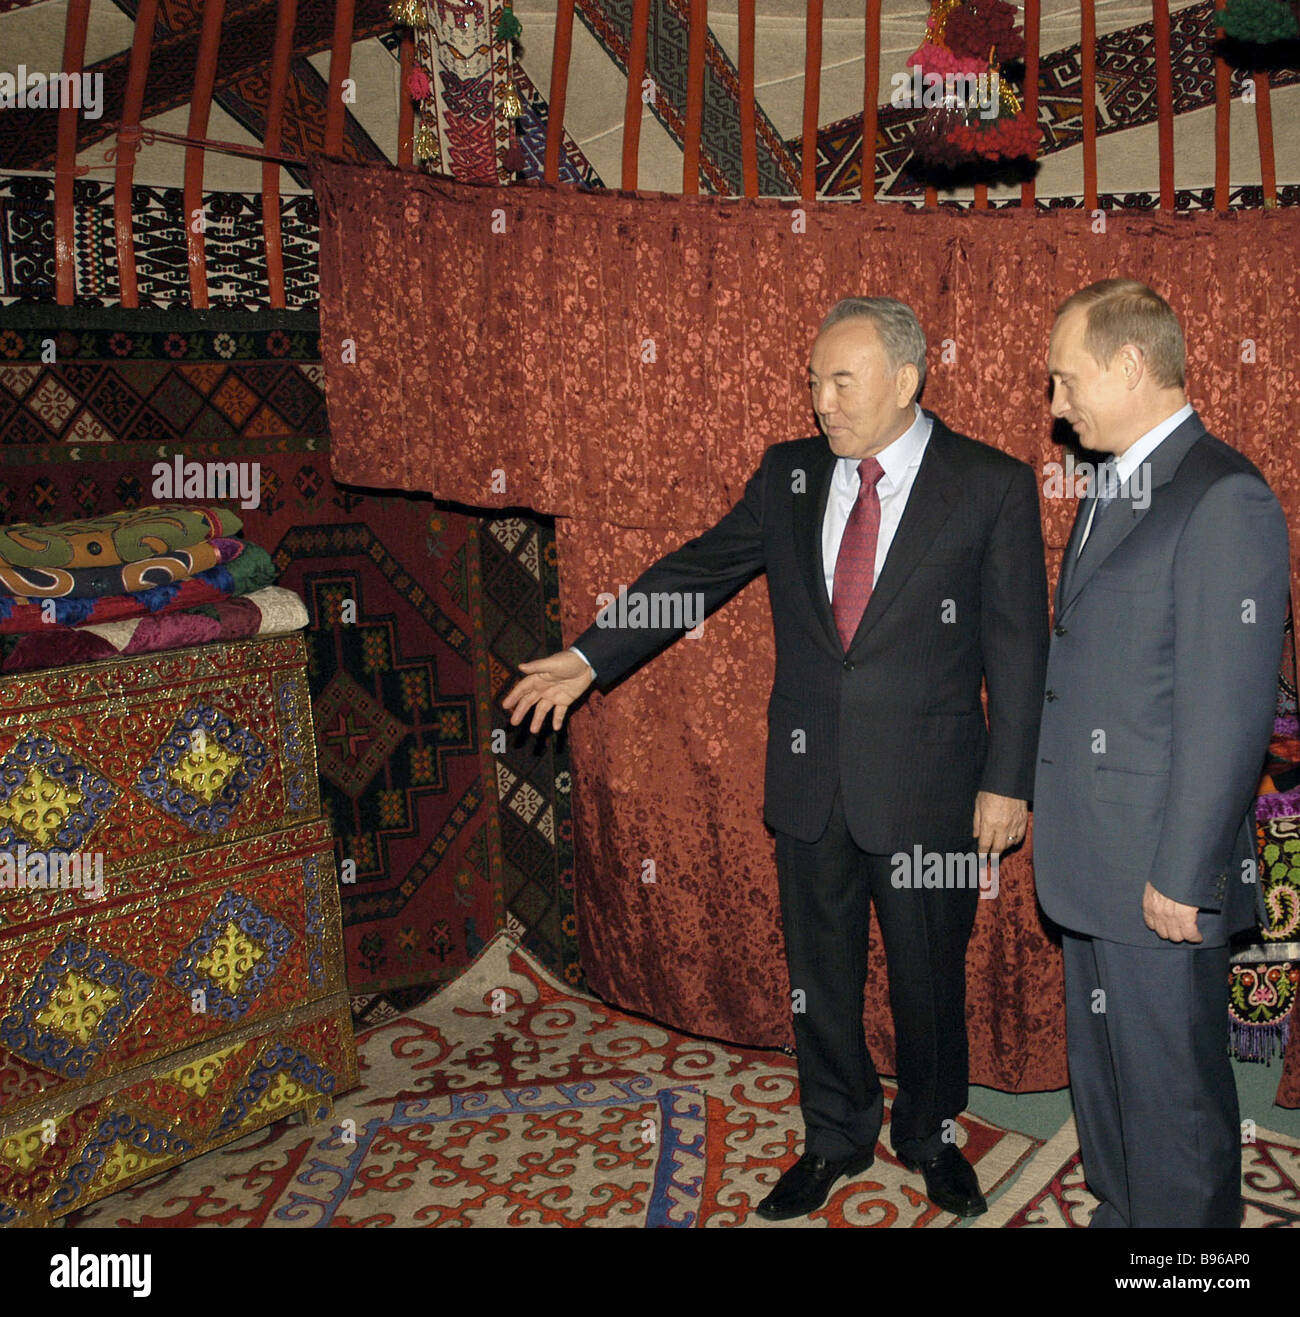 Russian President Vladimir Putin accompanied by Kazakh President Nursultan Nazarbayev at Astana based Presidential - Stock Image